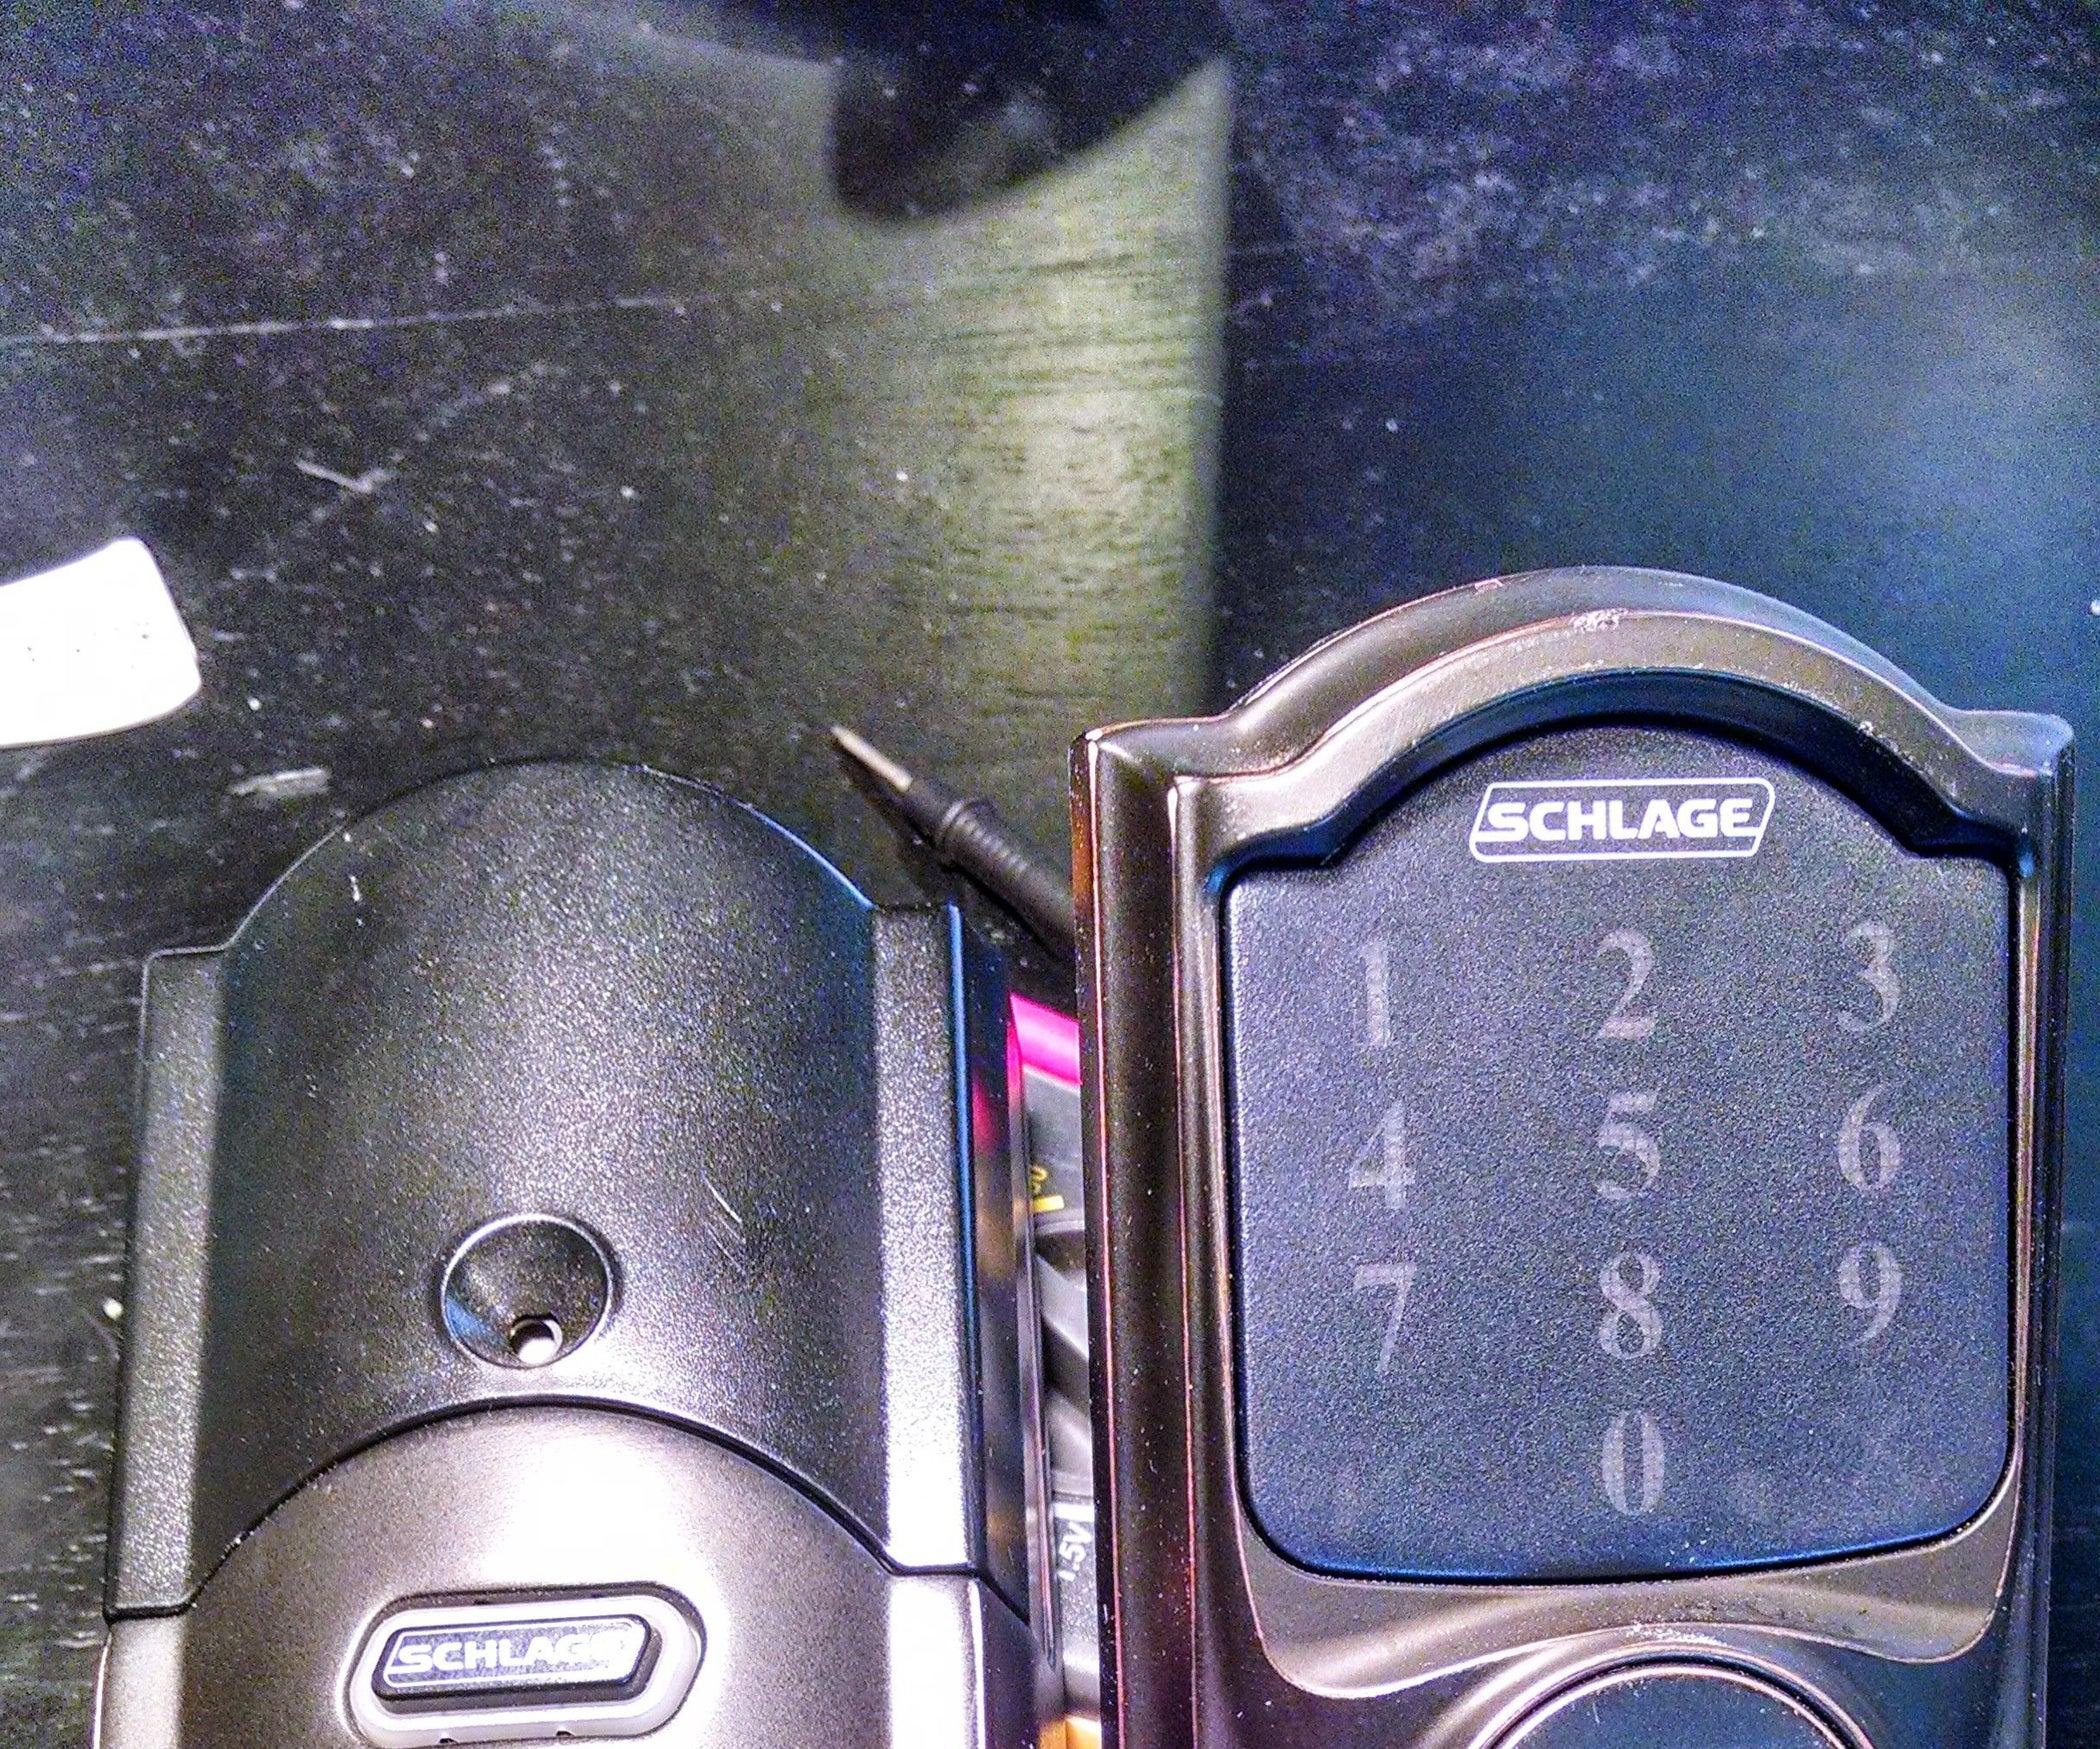 Touchscreen Repair: Schlage BE469NXCAM716 Camelot Touchscreen Deadbolt With  Z-Wave Technology : 6 Steps